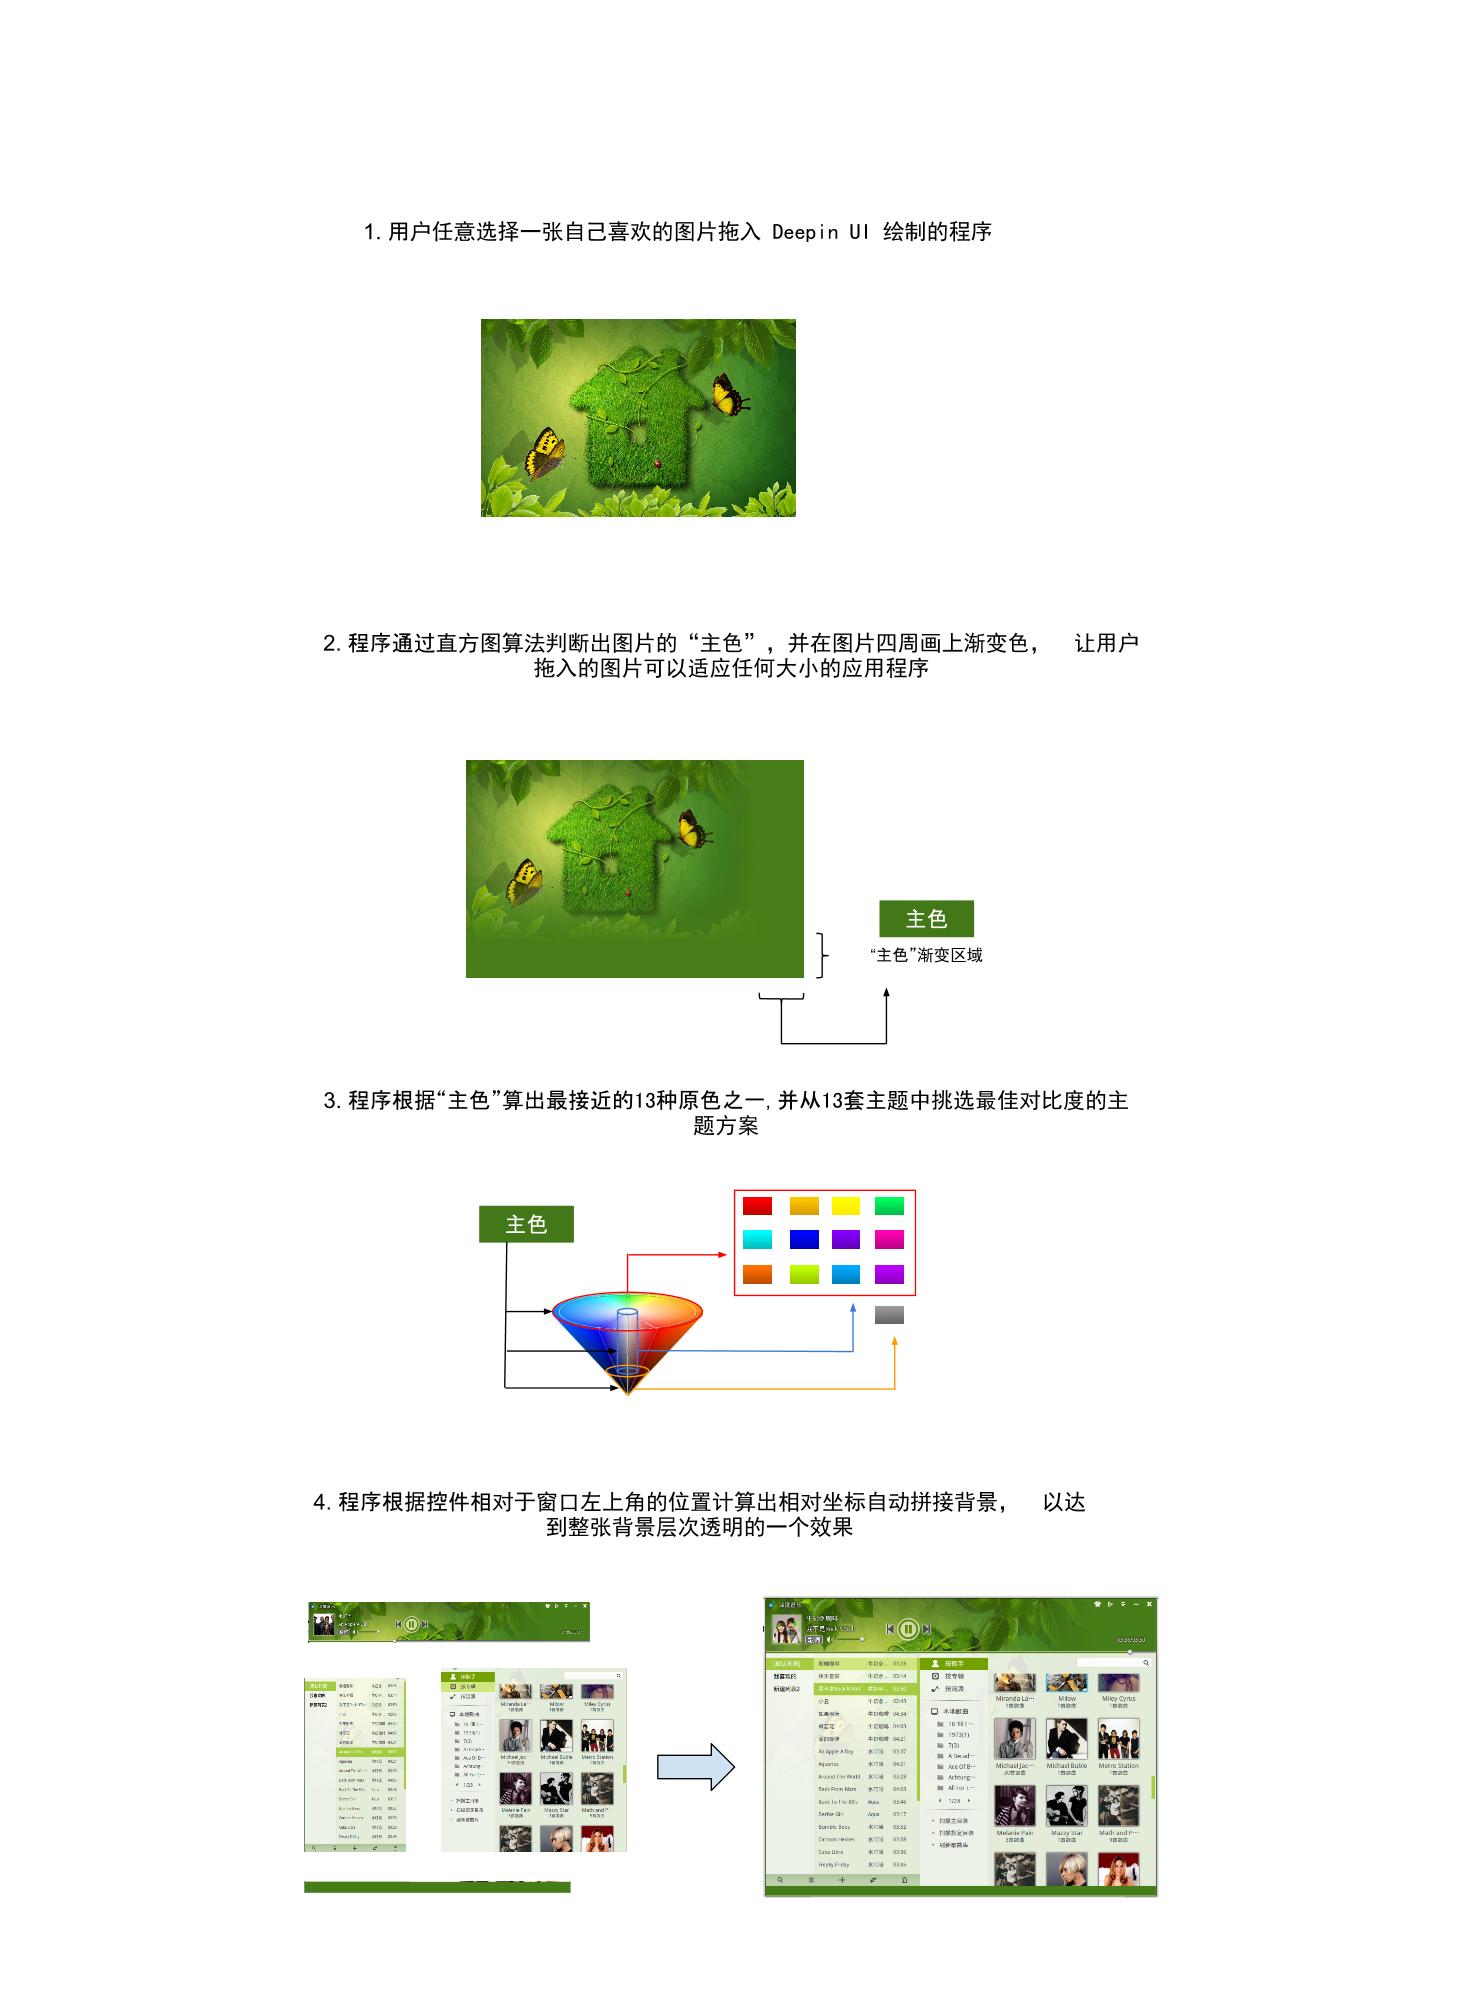 Deepin UI 参考手册(1)